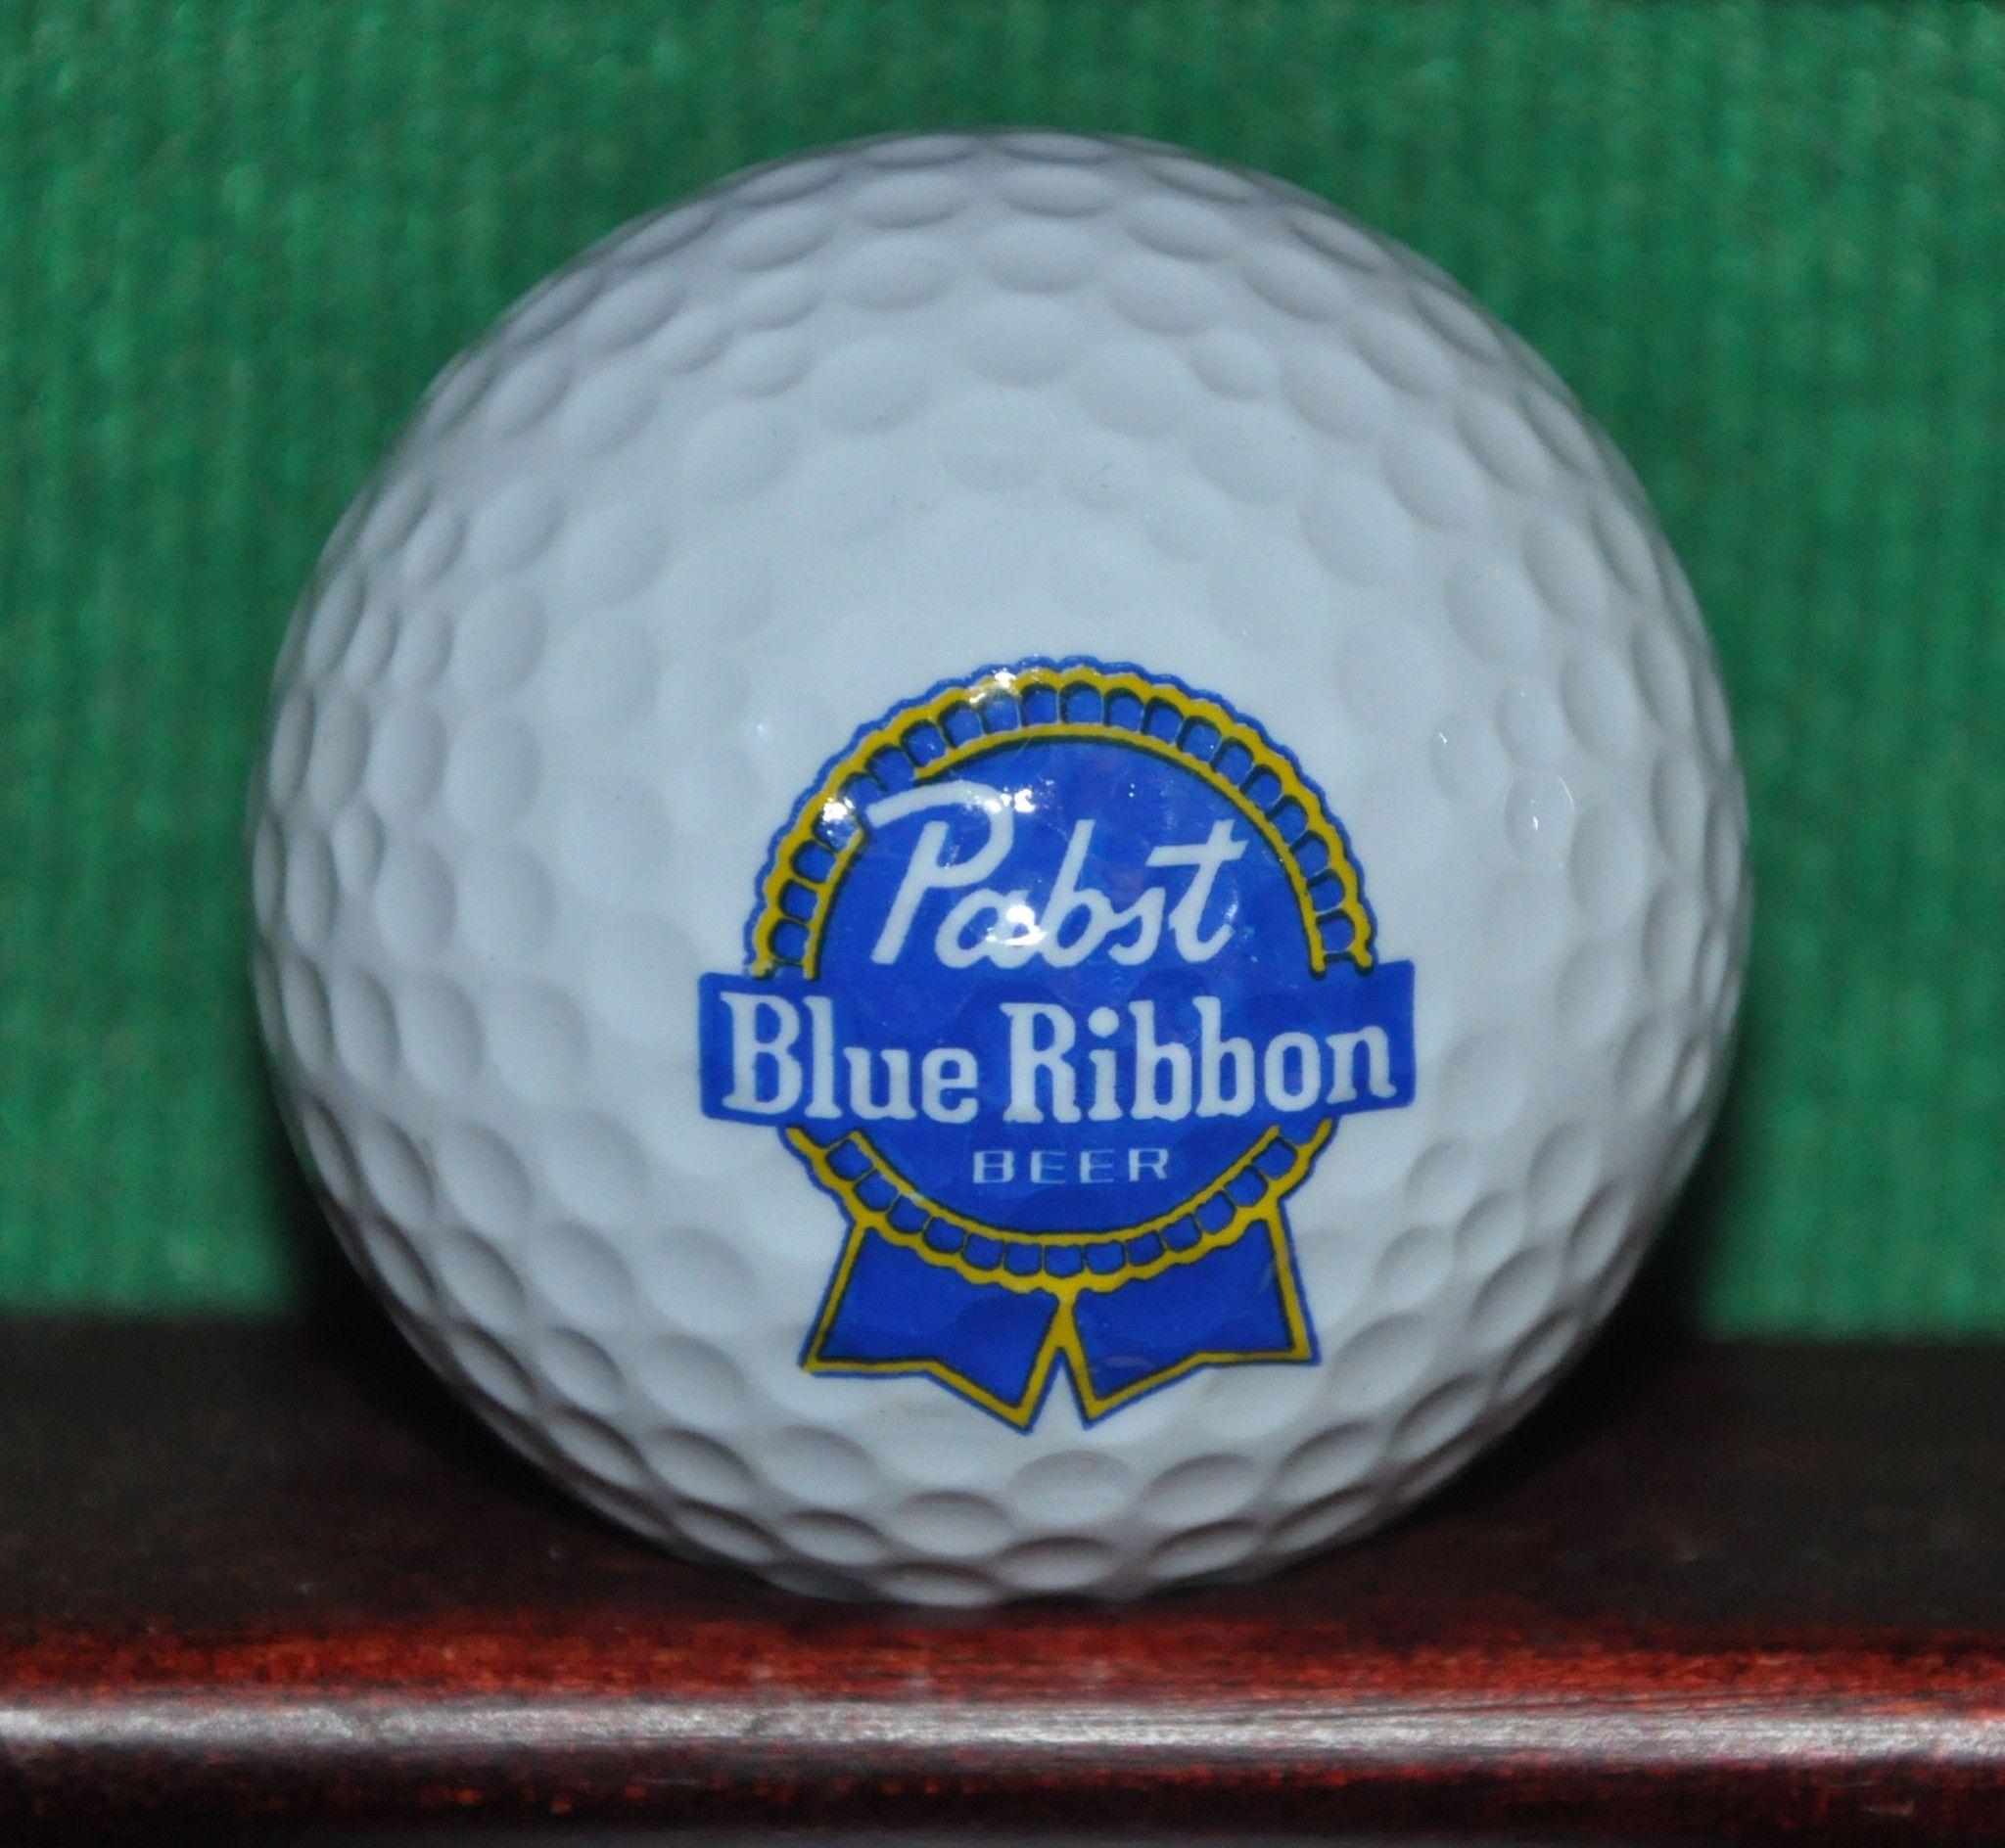 40+ Bf goodrich golf ball ideas in 2021